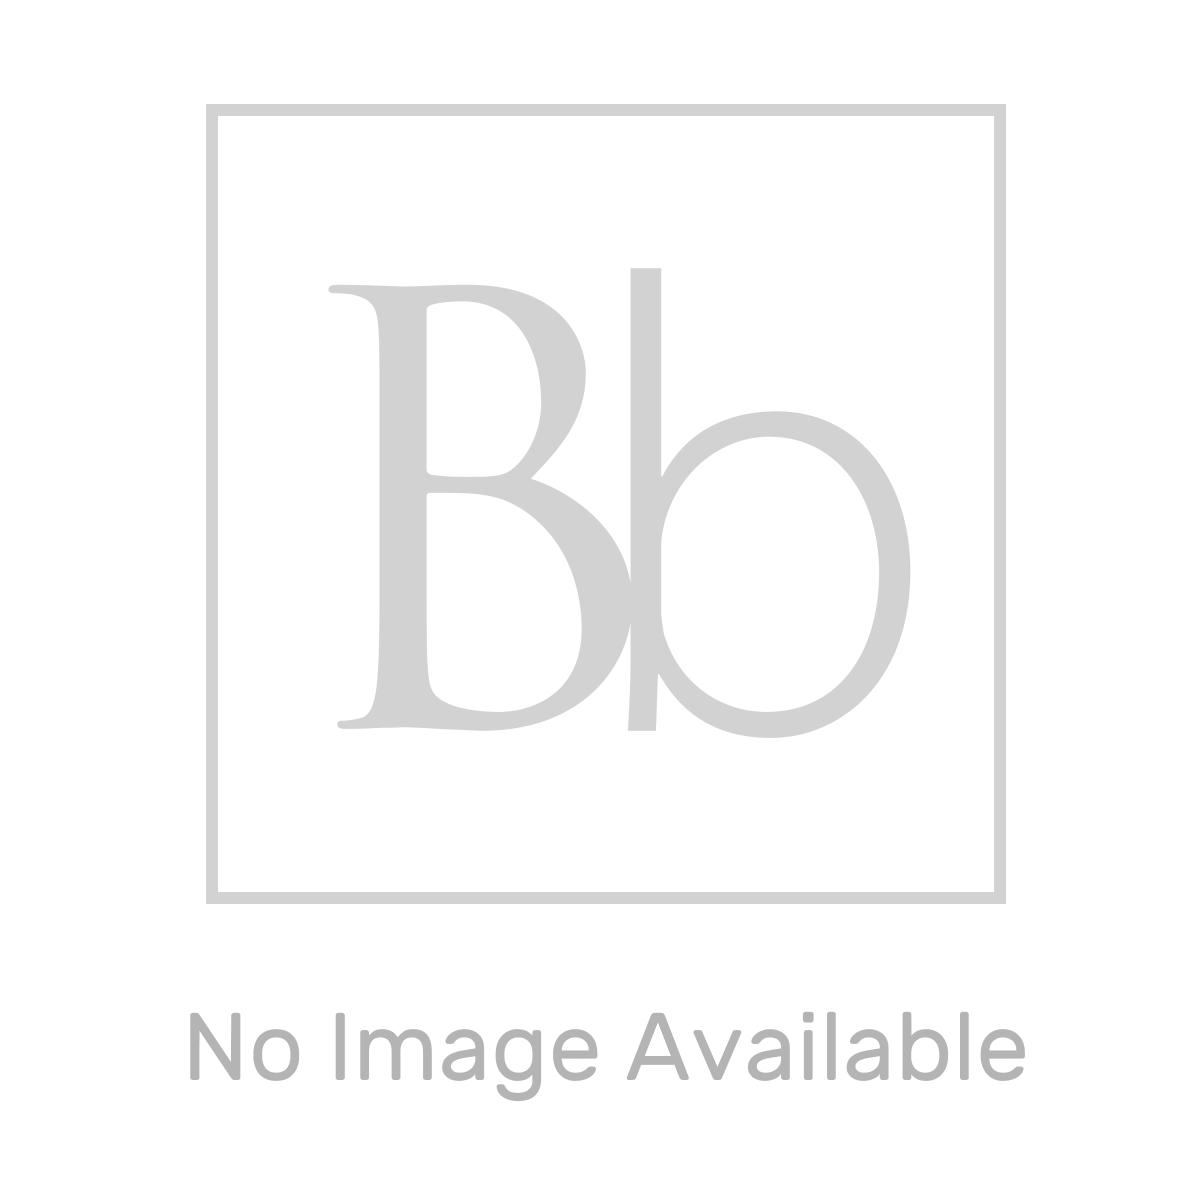 Aquadart White Slate Shower Tray 1600 x 760 Overhead